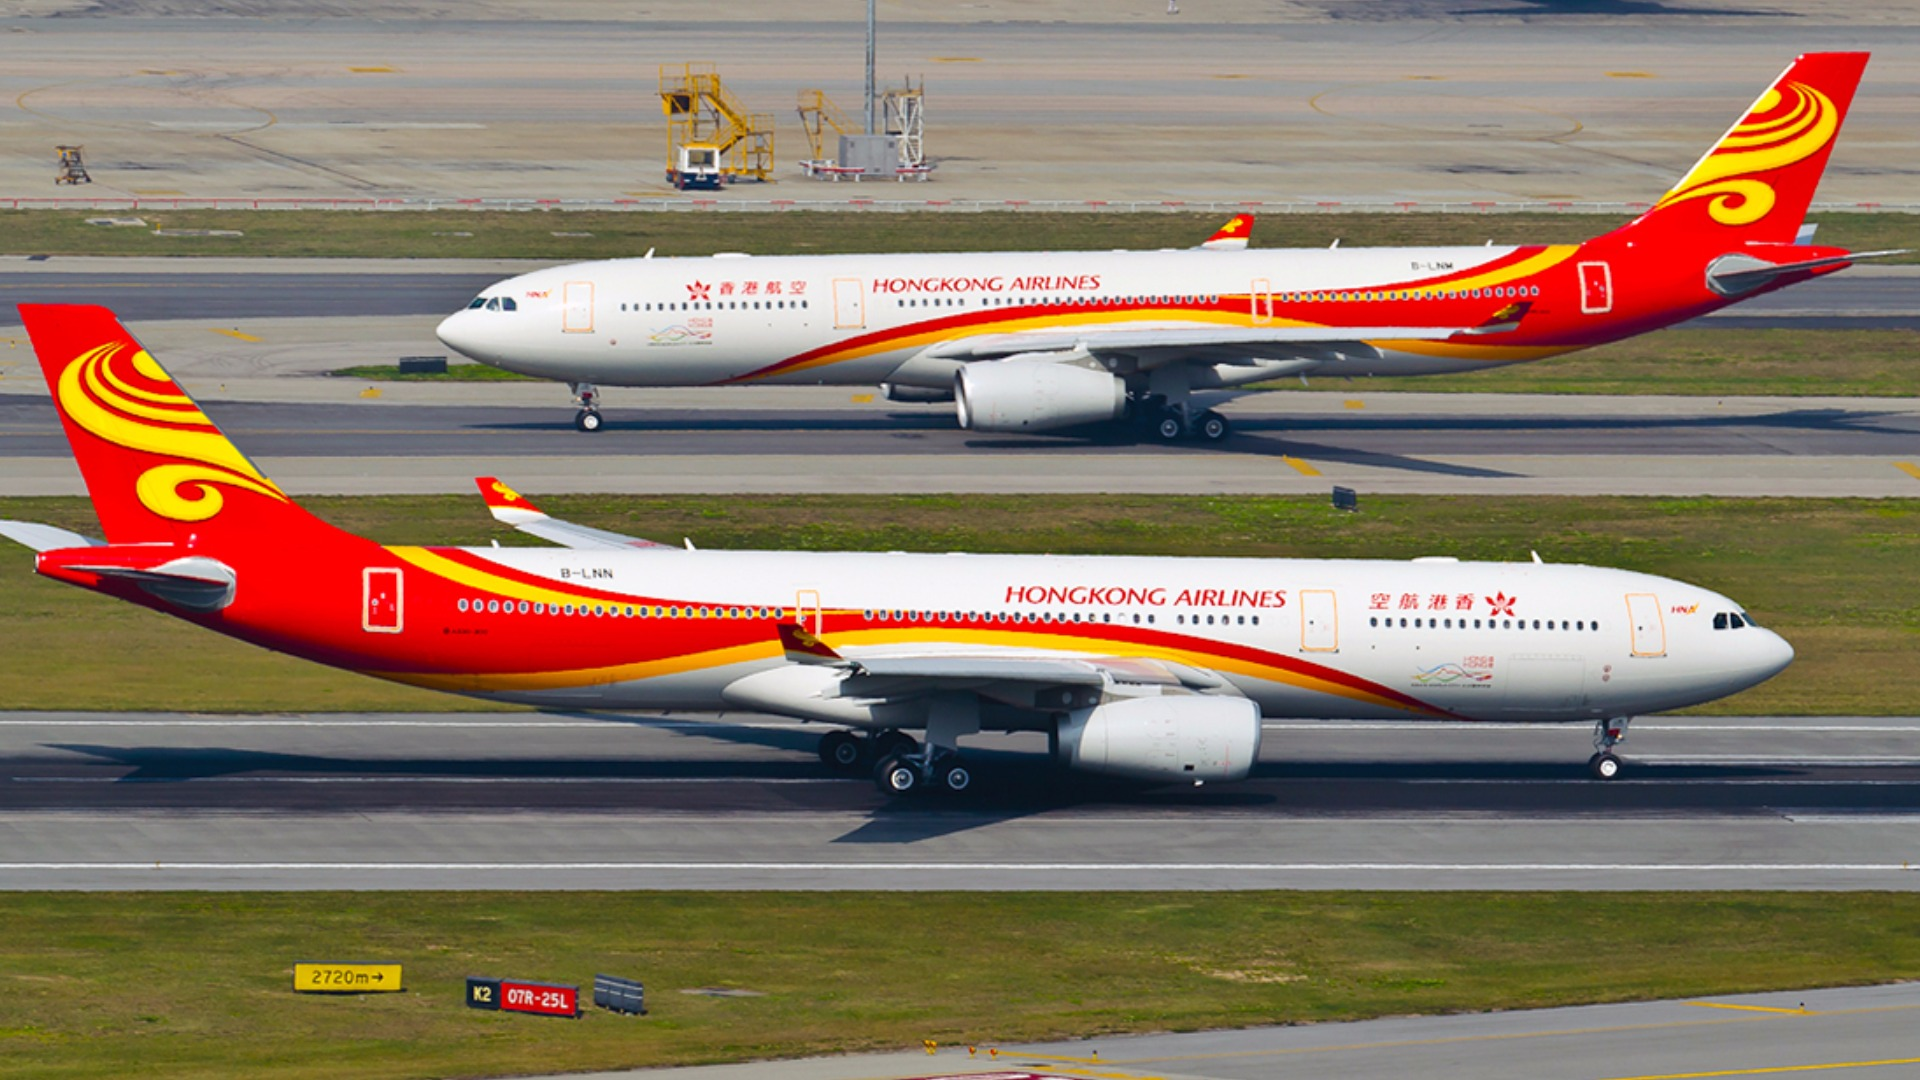 Hong Kong Airlines - Авиакомпания Hong Kong Airlines получила Airbus A350-900